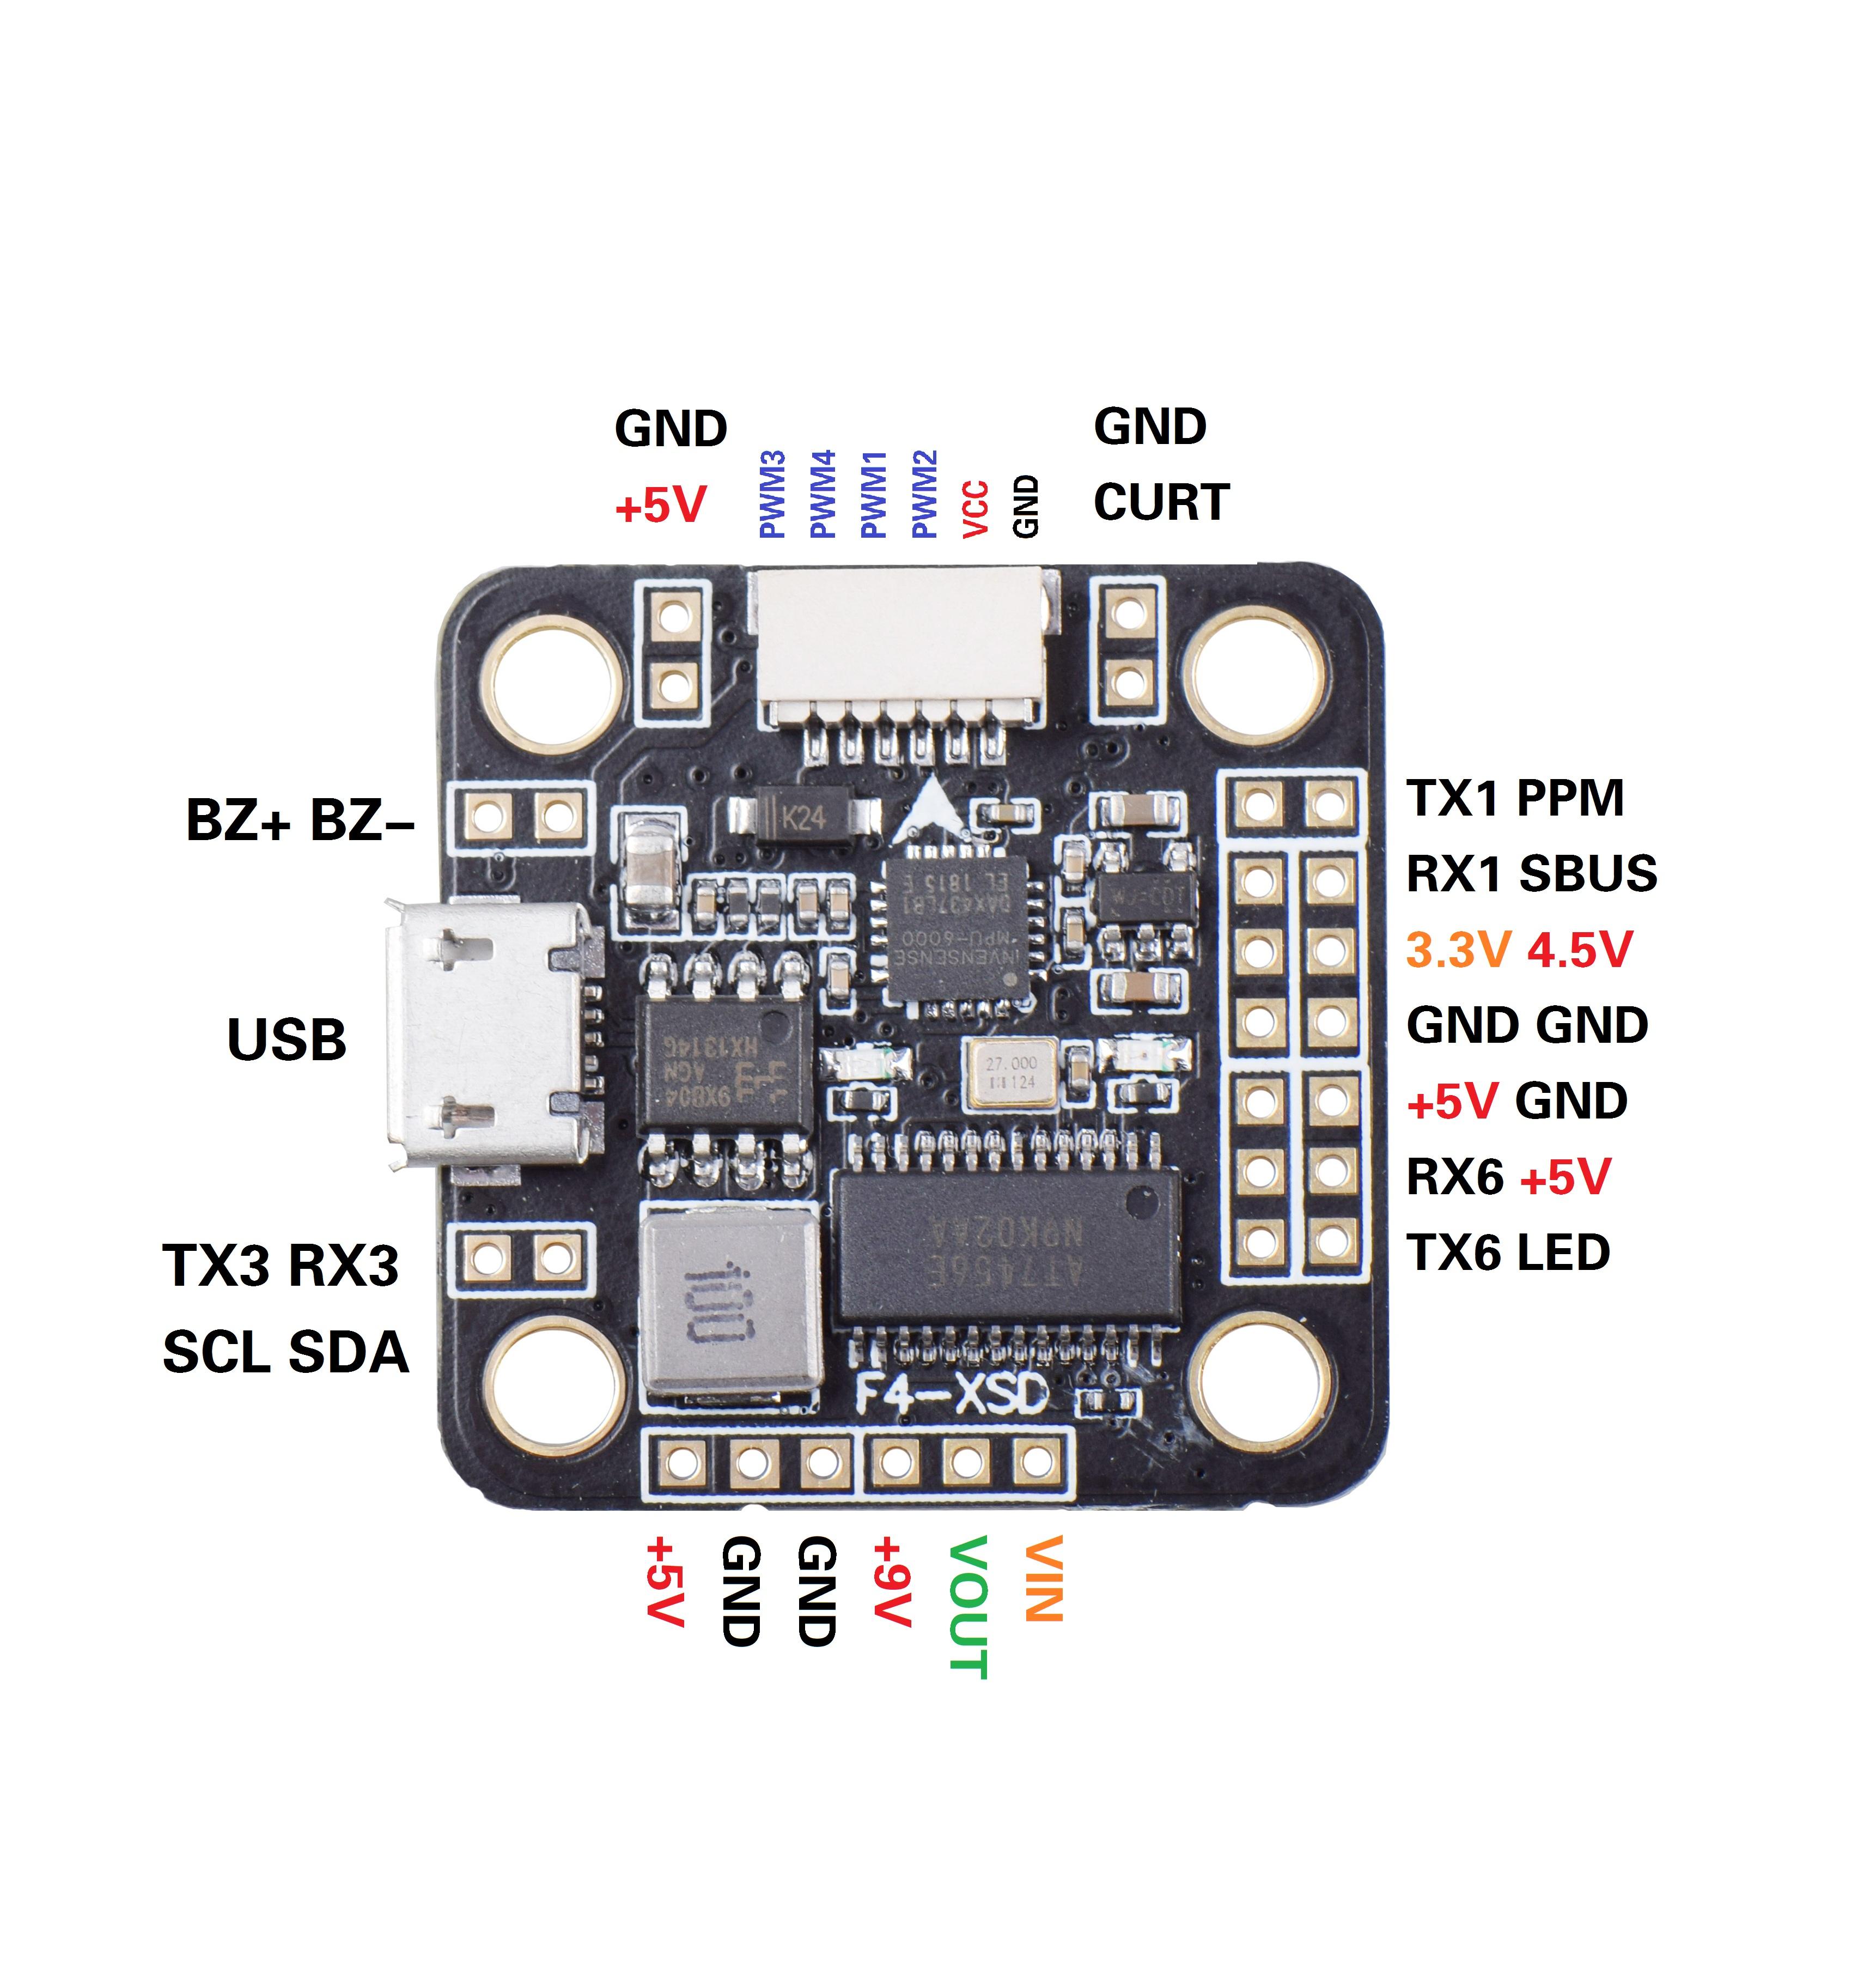 Betaflight F4-XSD Flight Controller Board 2-6S Built-in OSD 5V 9V BEC for Mini 150 130 FPV Racer Drone Support SBUS PPM RX gray